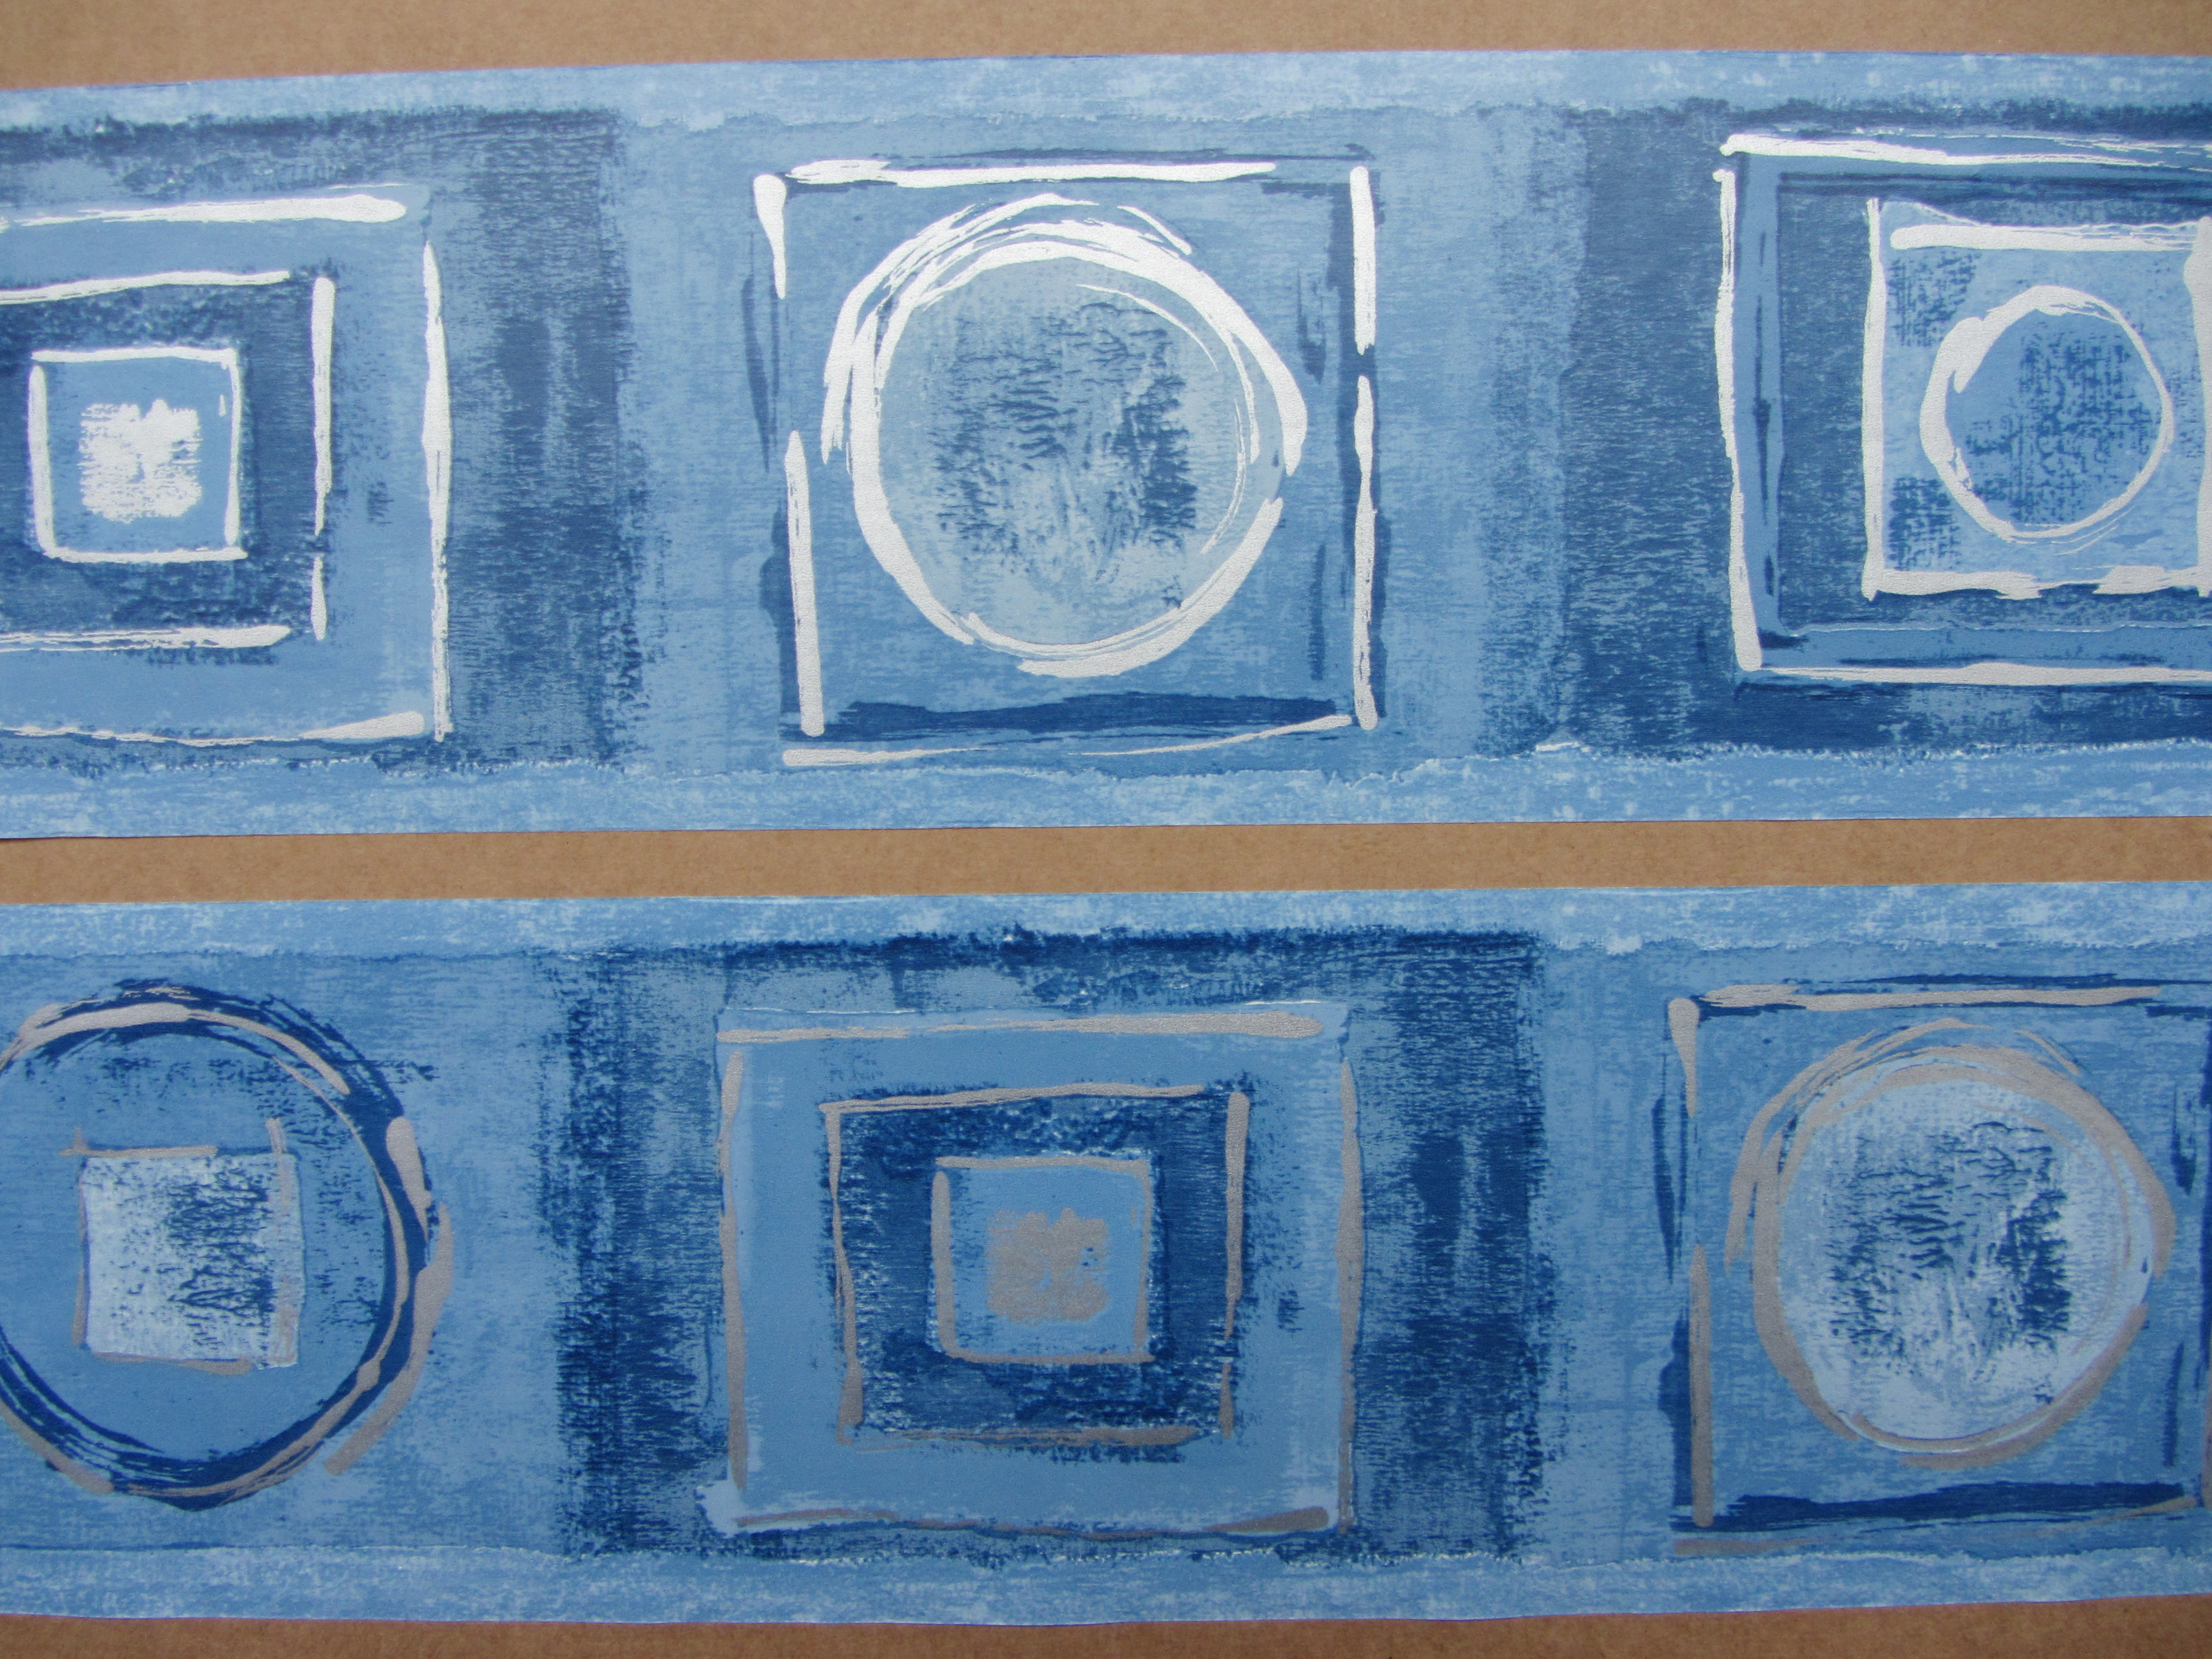 SAHARA DENIH BLUE WALLPAPER BORDER SELF ADHESIVE BEDROOM 5 x 12 5cm 4000x3000